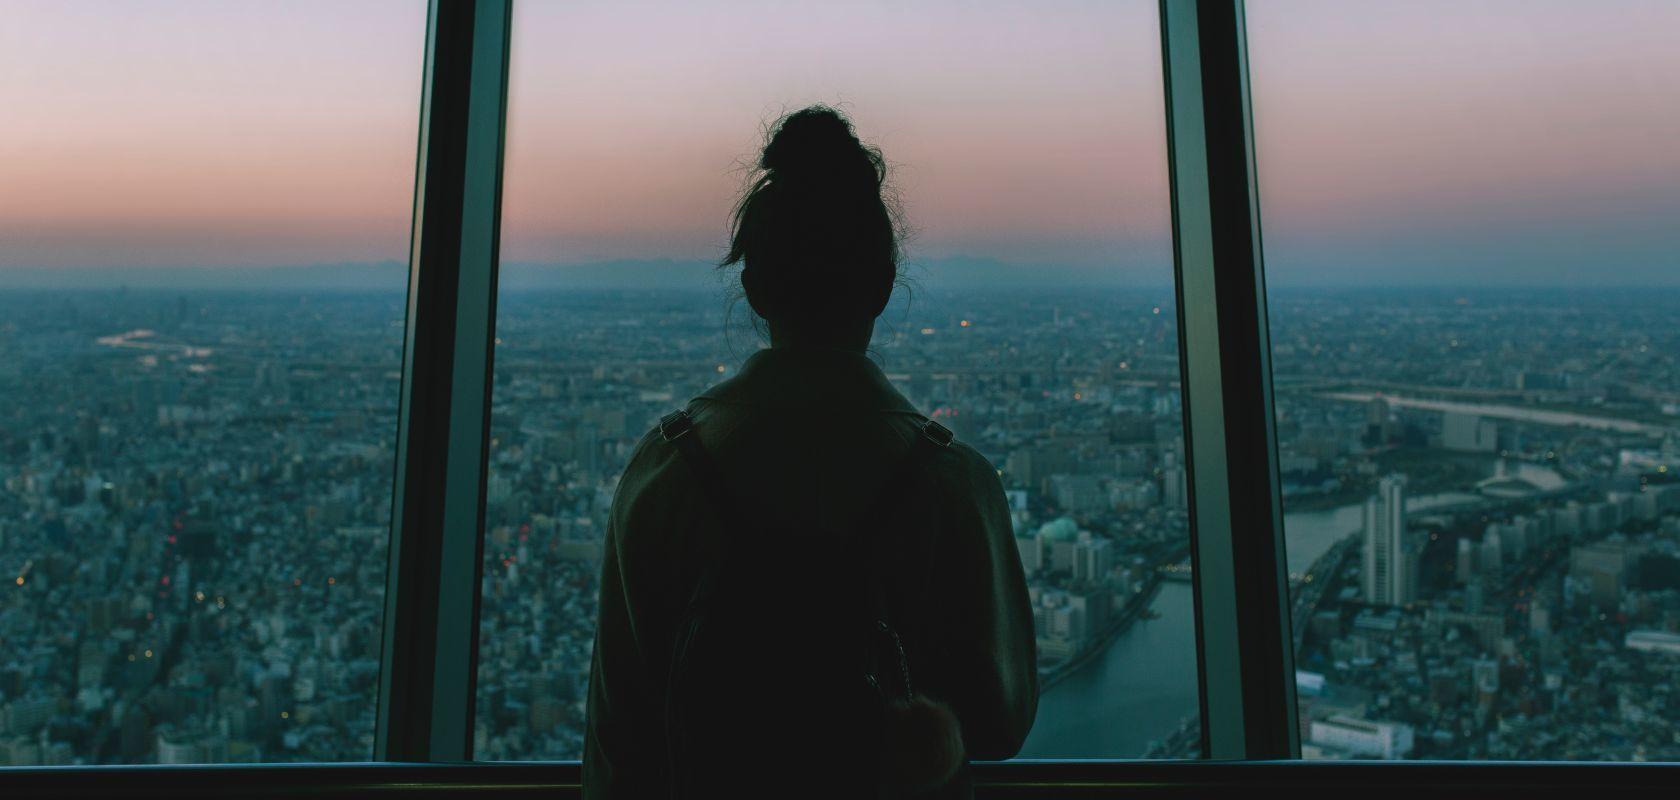 5 Alasan Tetap Kesepian Walaupun Punya Banyak Teman